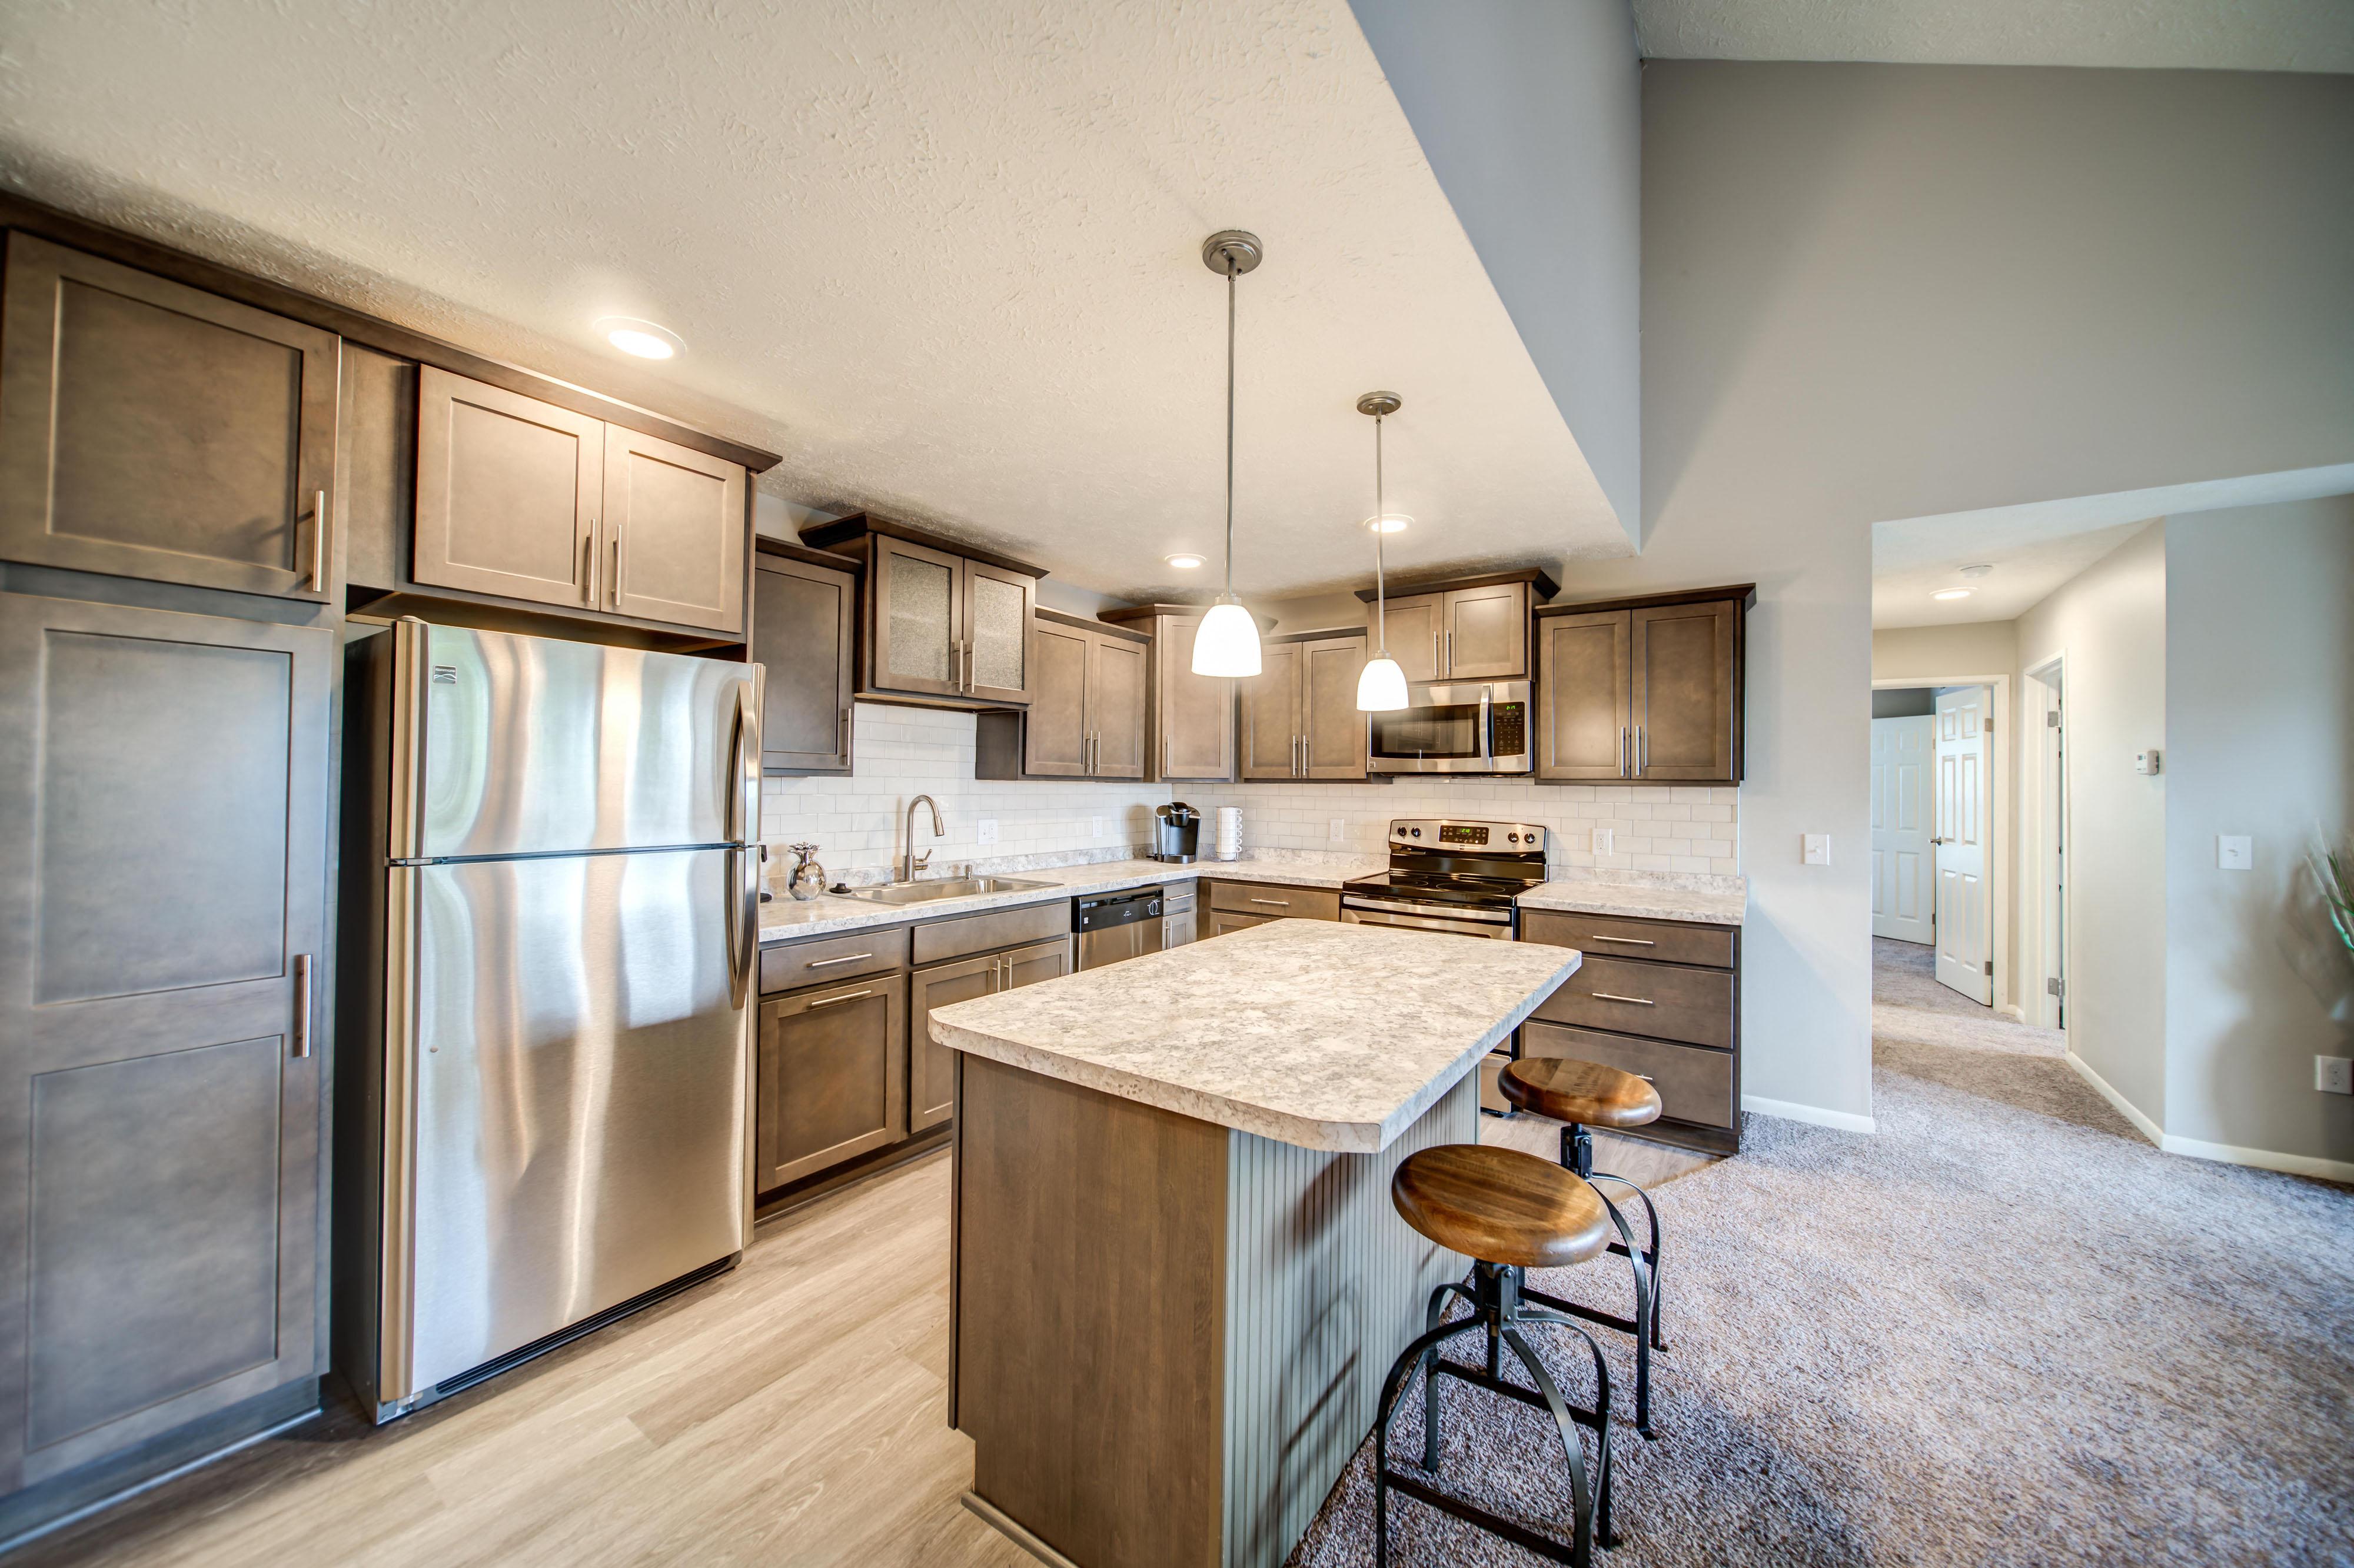 Luxury Remodeled Kitchen Area